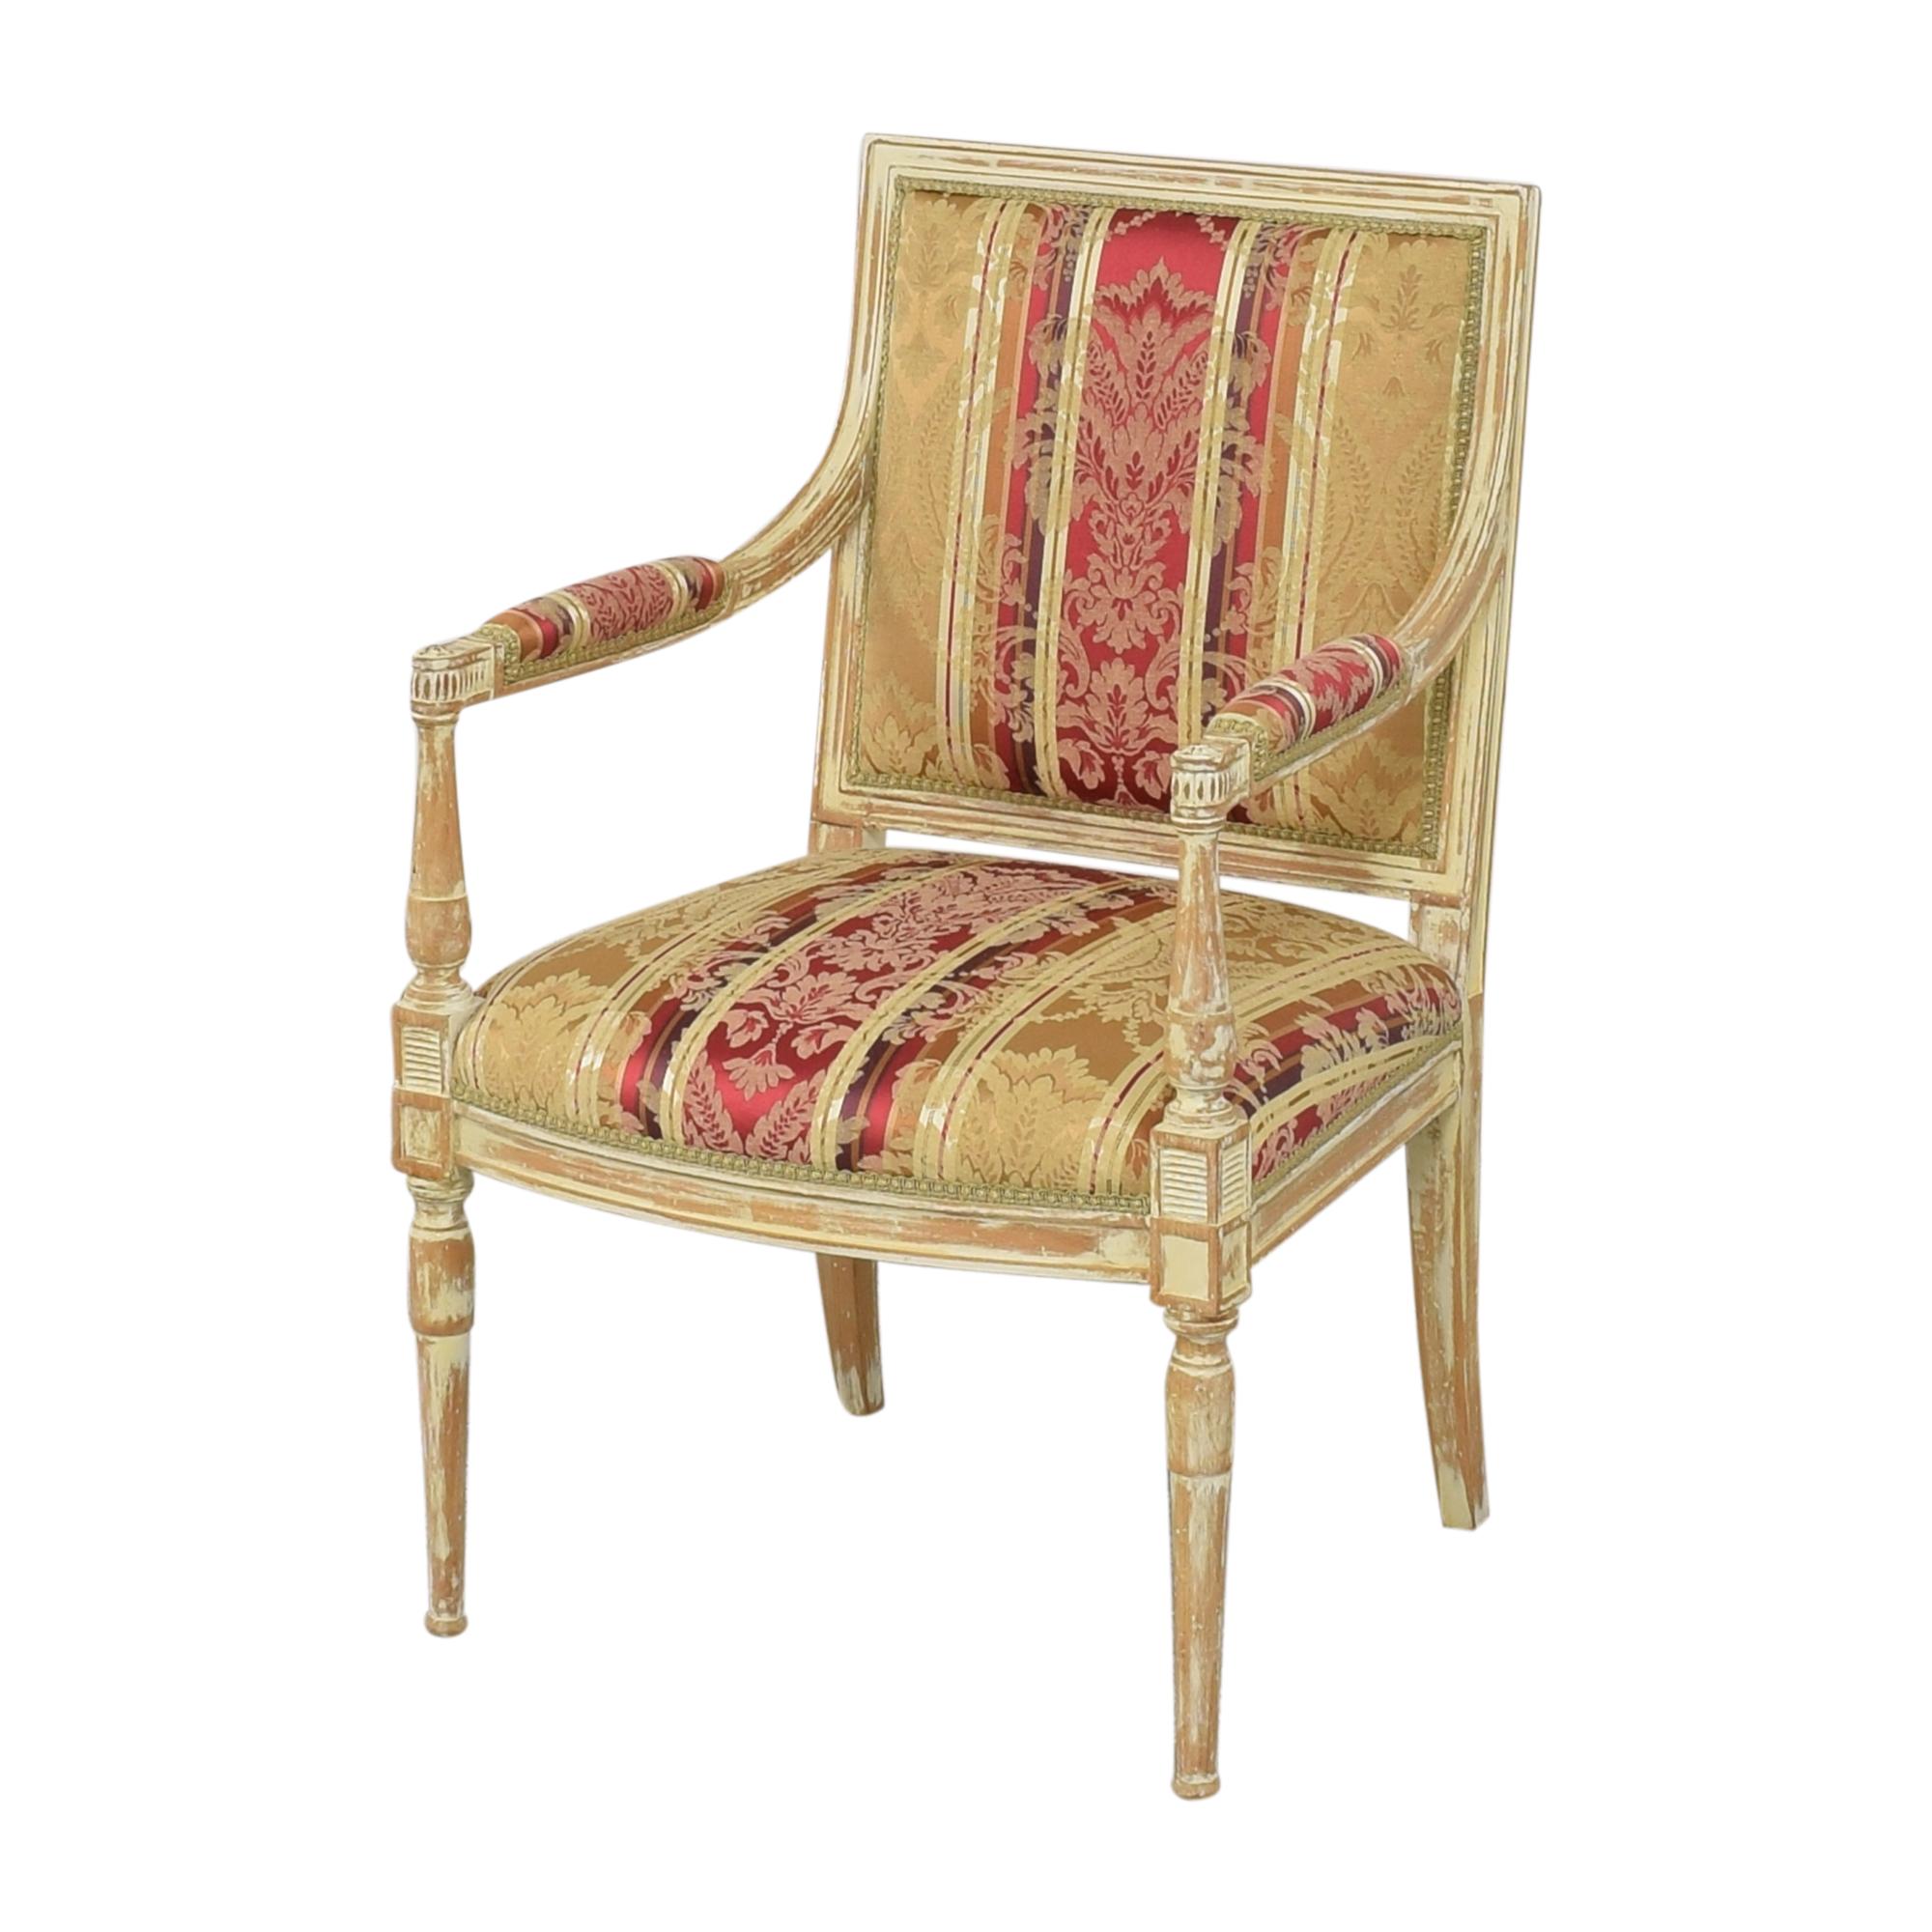 ABC Carpet & Home ABC Carpet & Home Louis XVI Style Chairs coupon